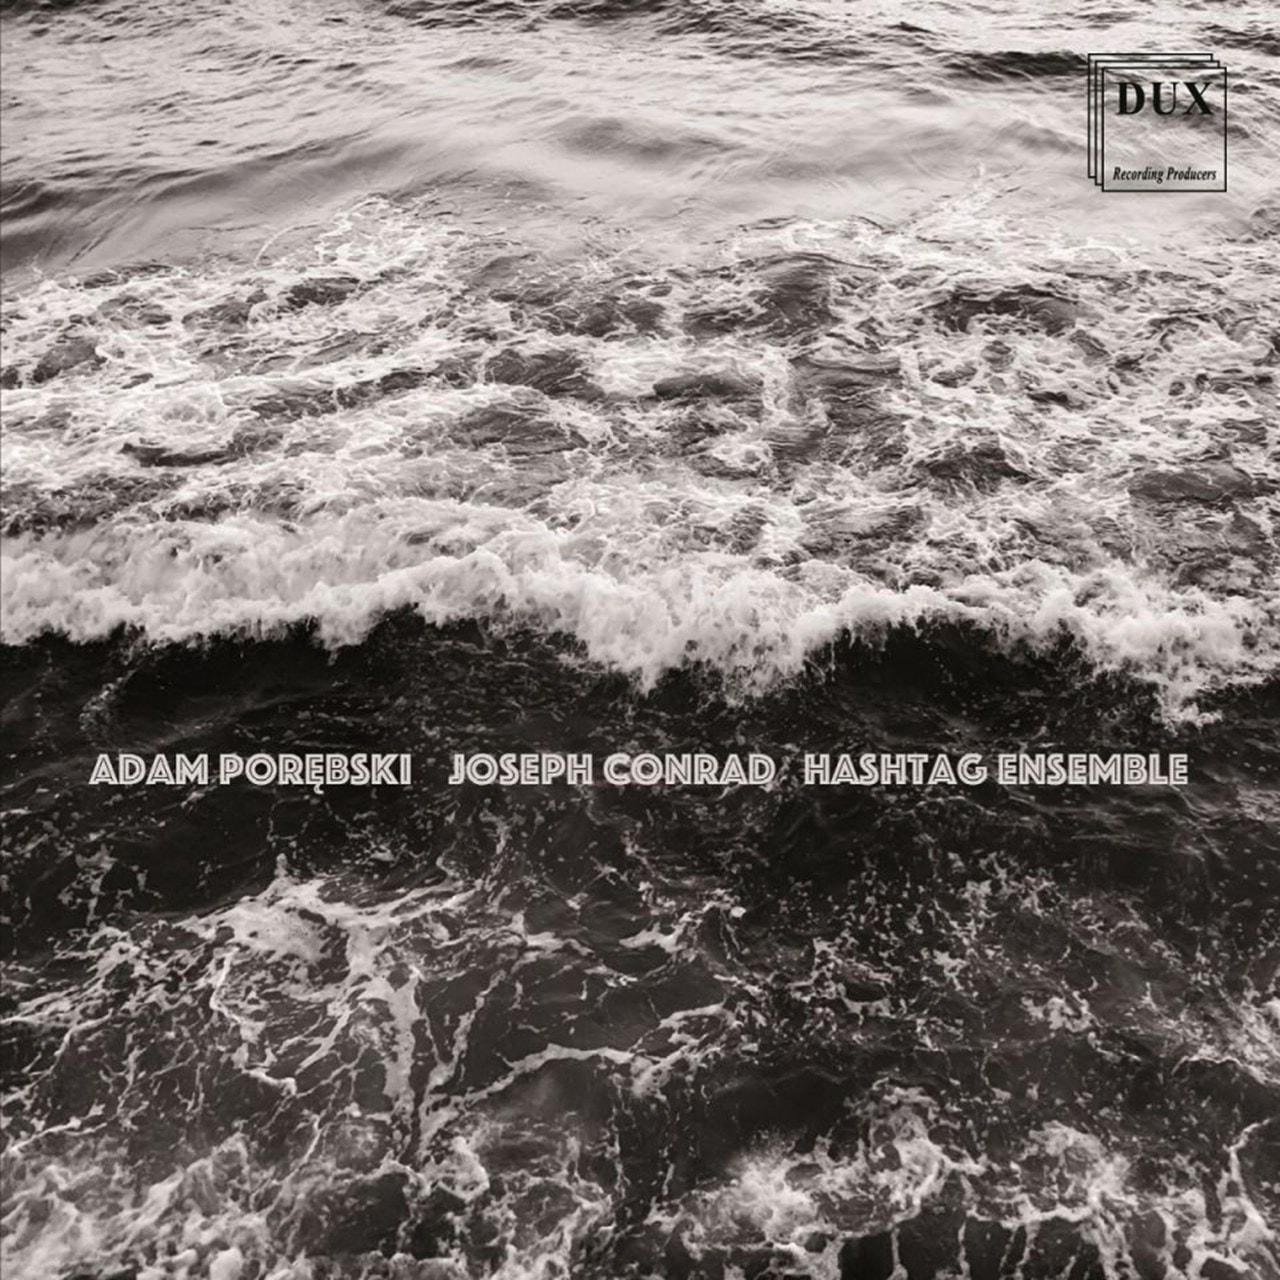 Adam Porebski: First Command - 1